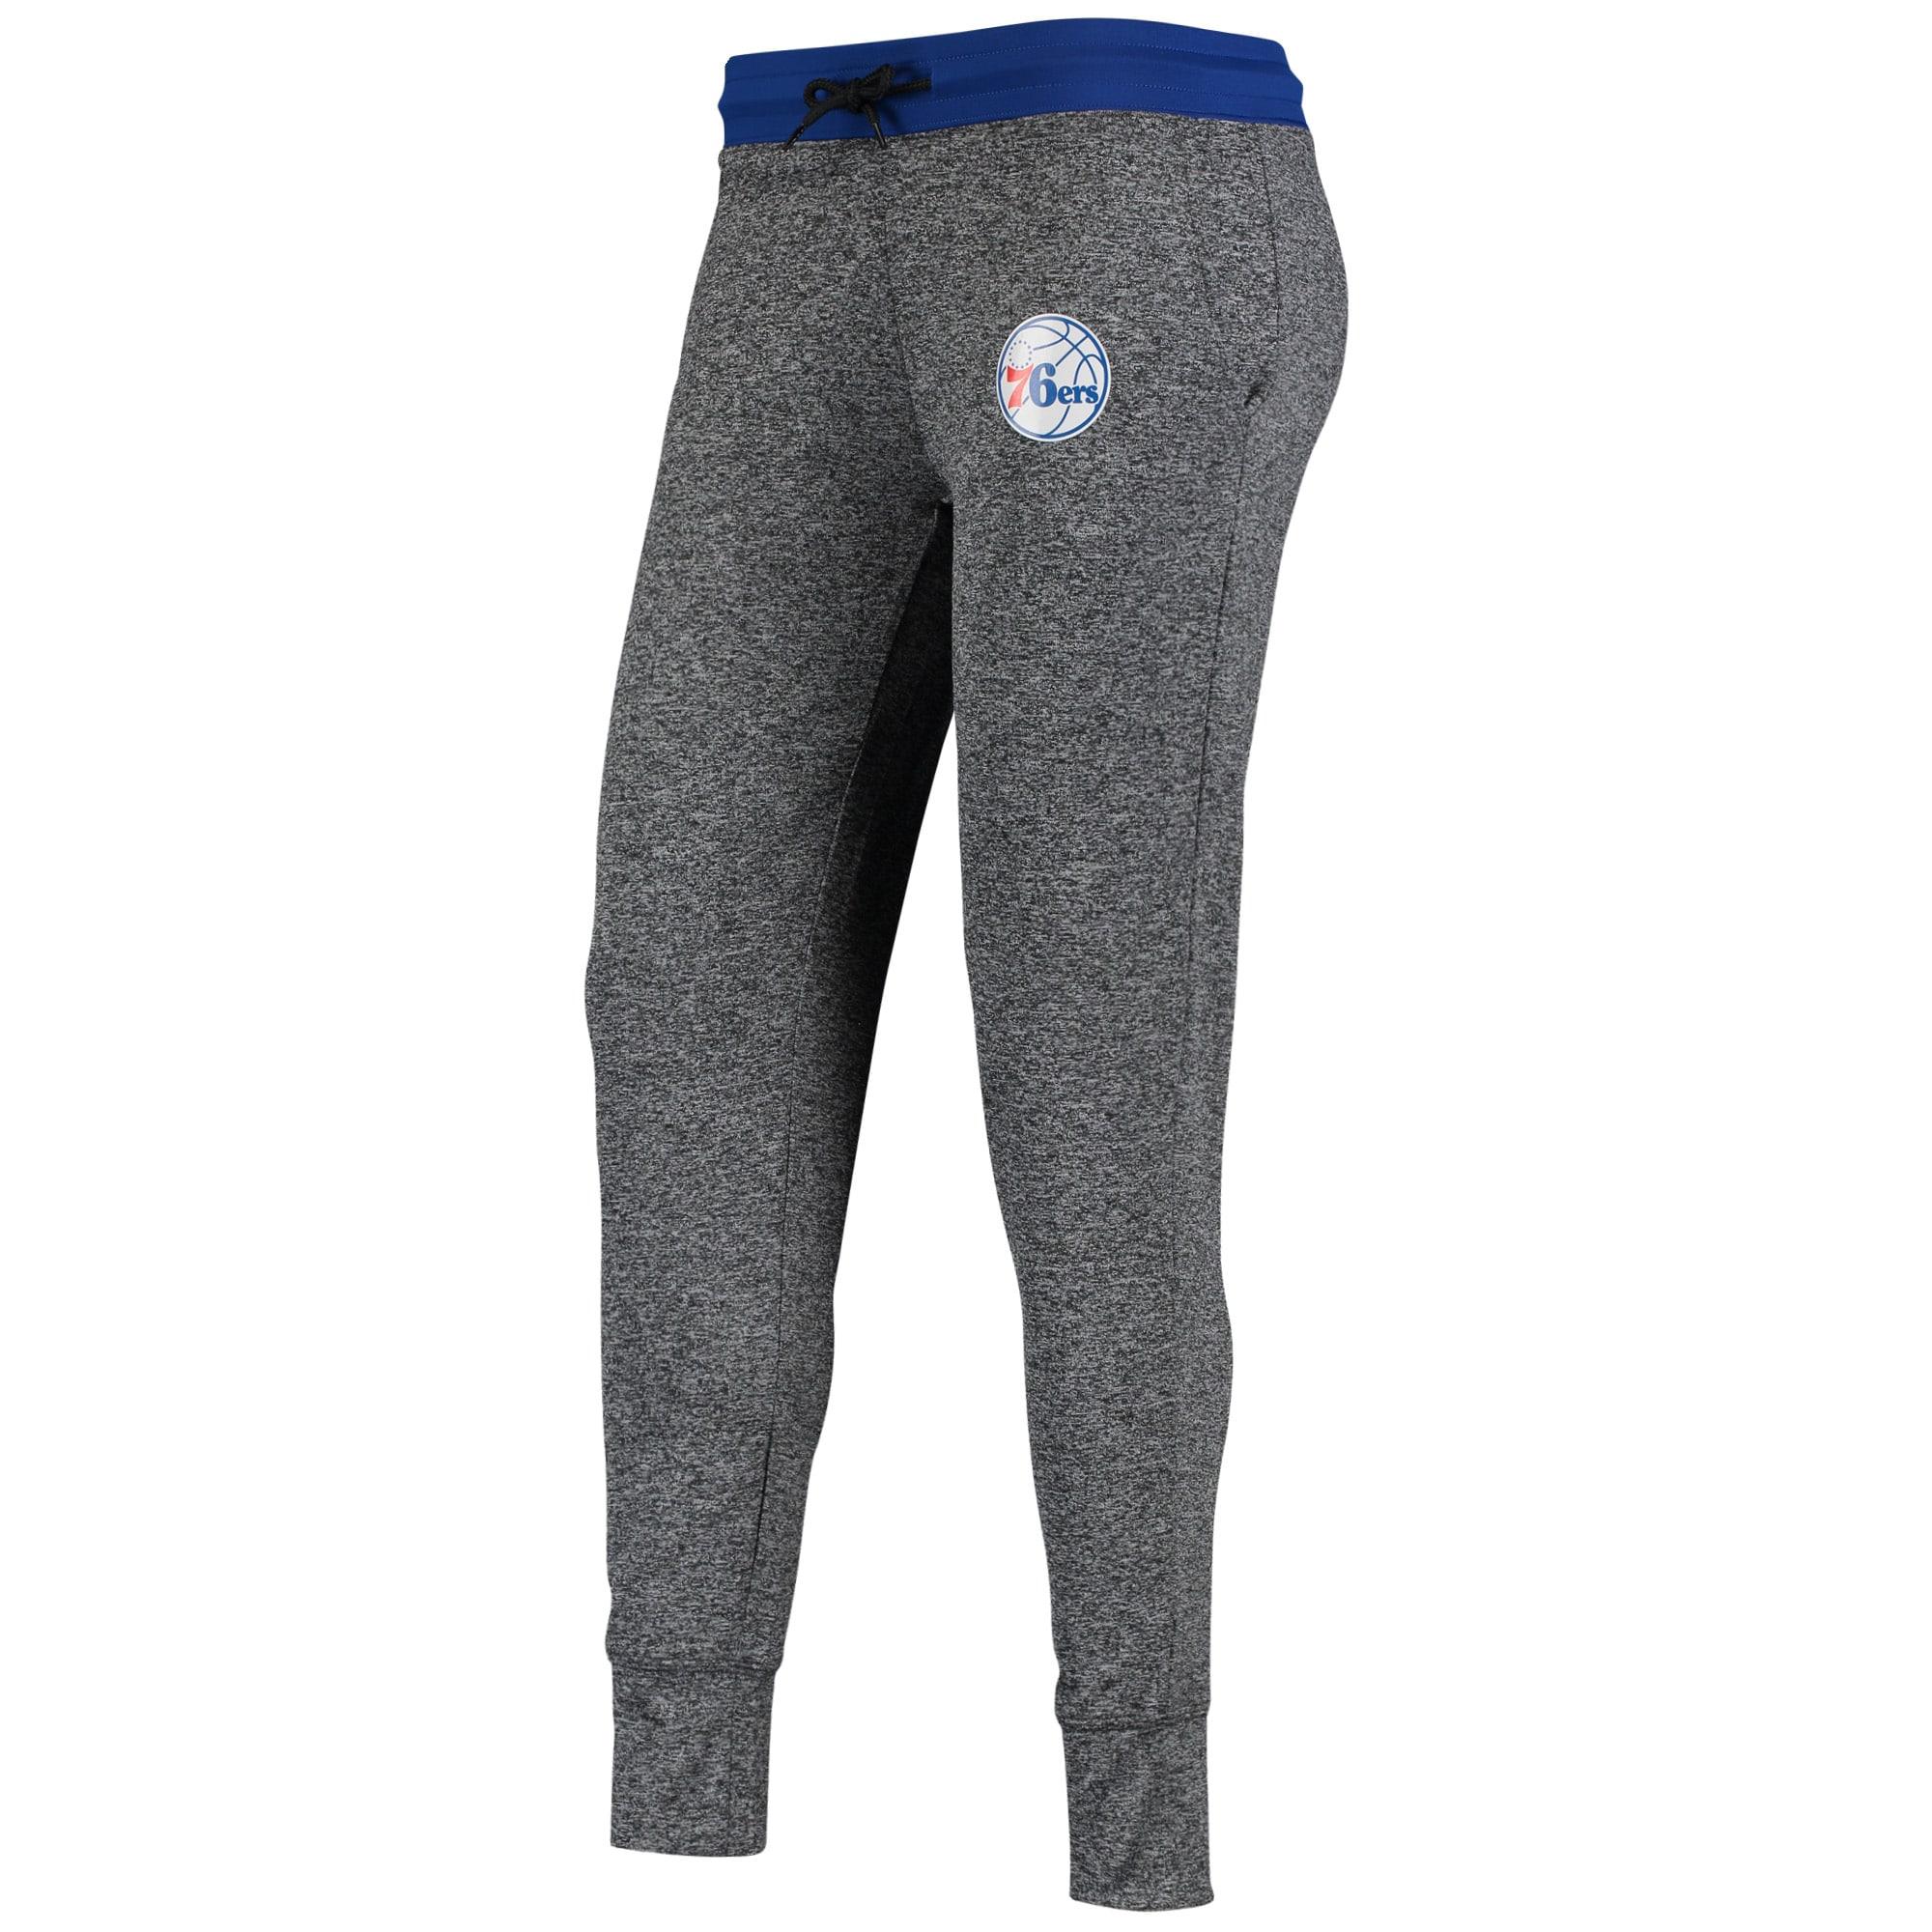 Philadelphia 76ers Fanatics Branded Women's Static Jogger Pant - Heathered Black/Royal